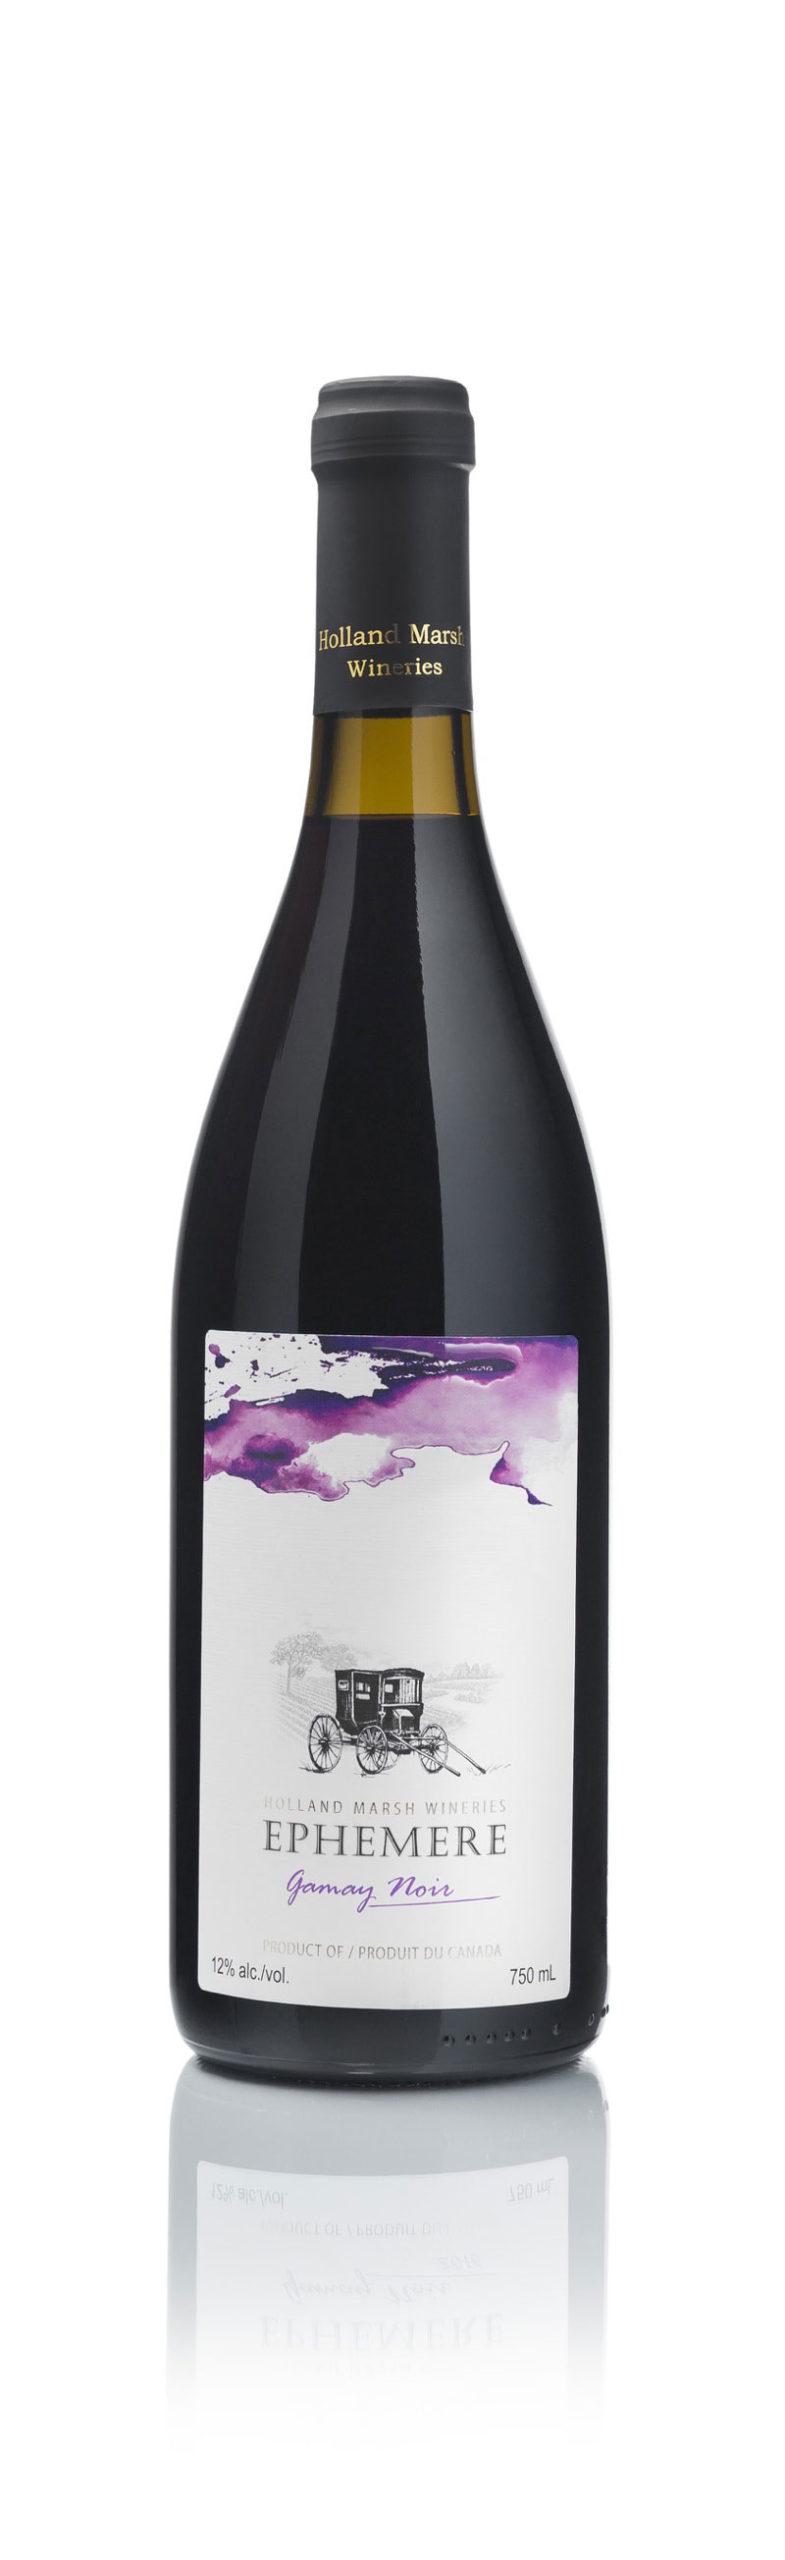 Holland Marsh Winery - 2014 Ephemere Gamay Noir